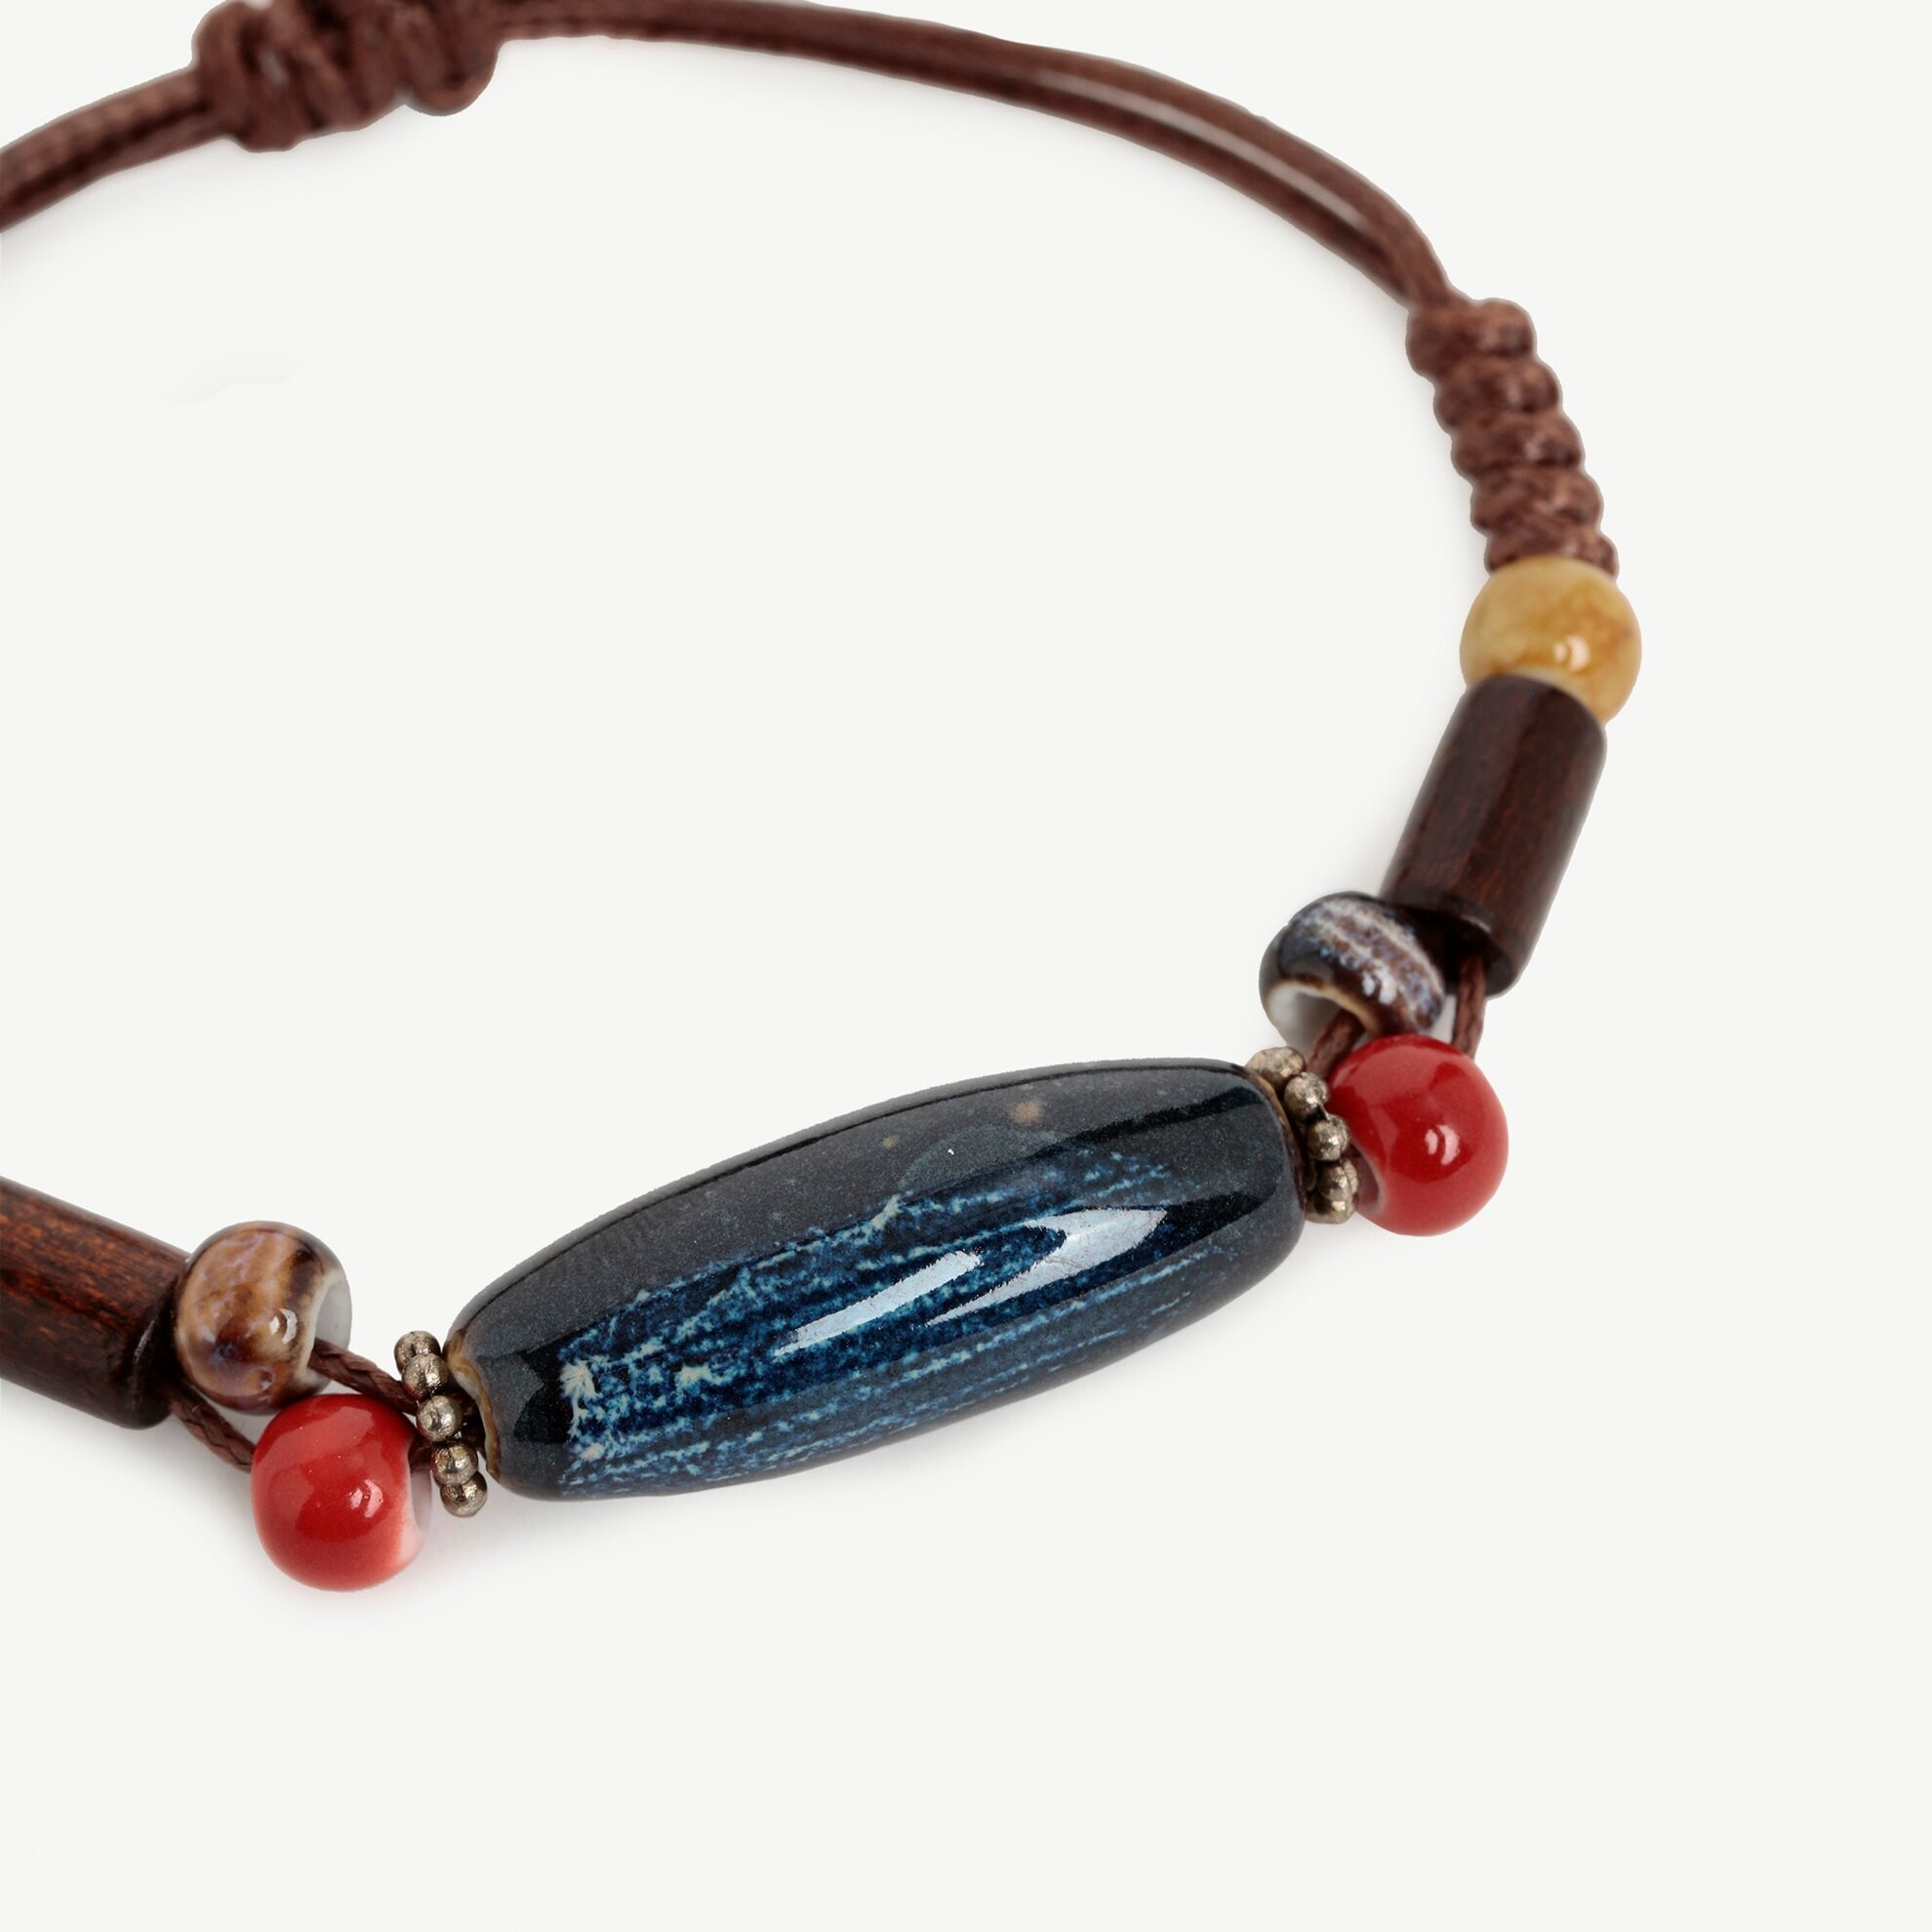 Armband mit Keramikteilen